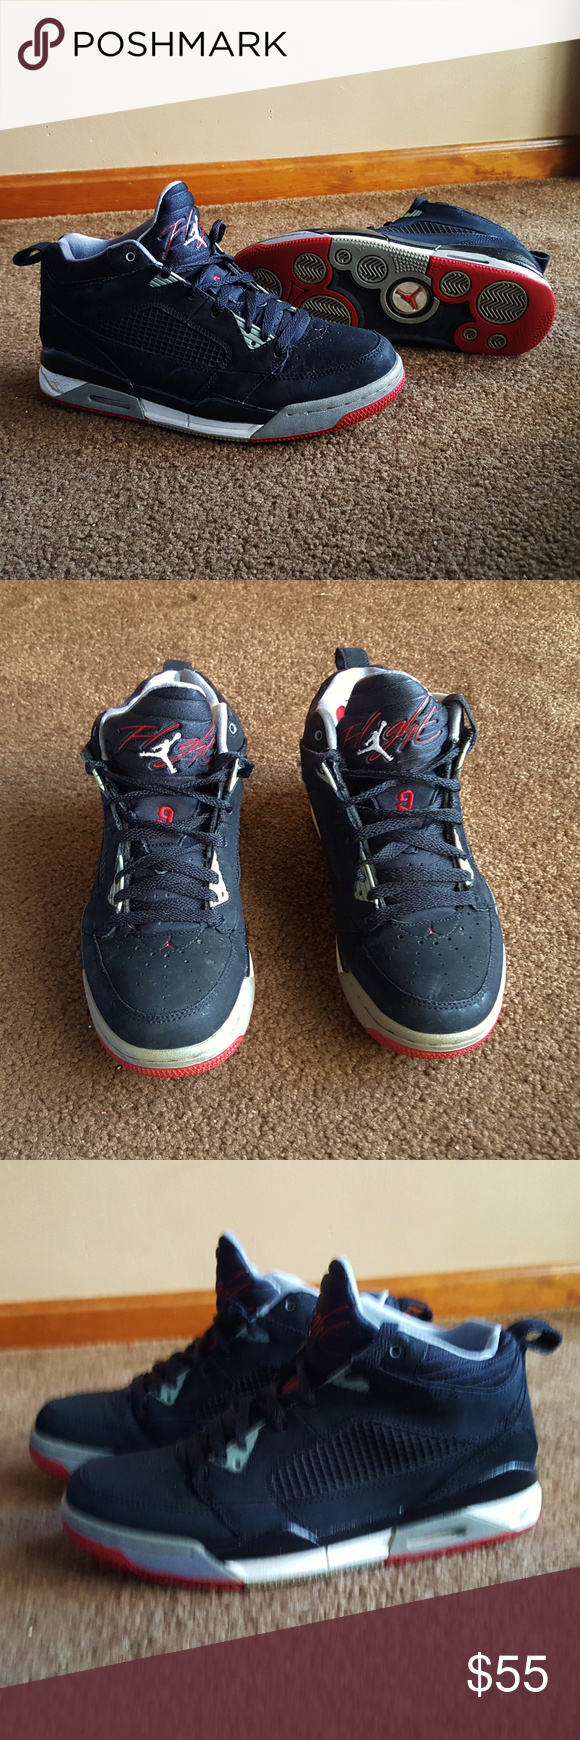 Jordan Air Flight 9 Basketball Shoes